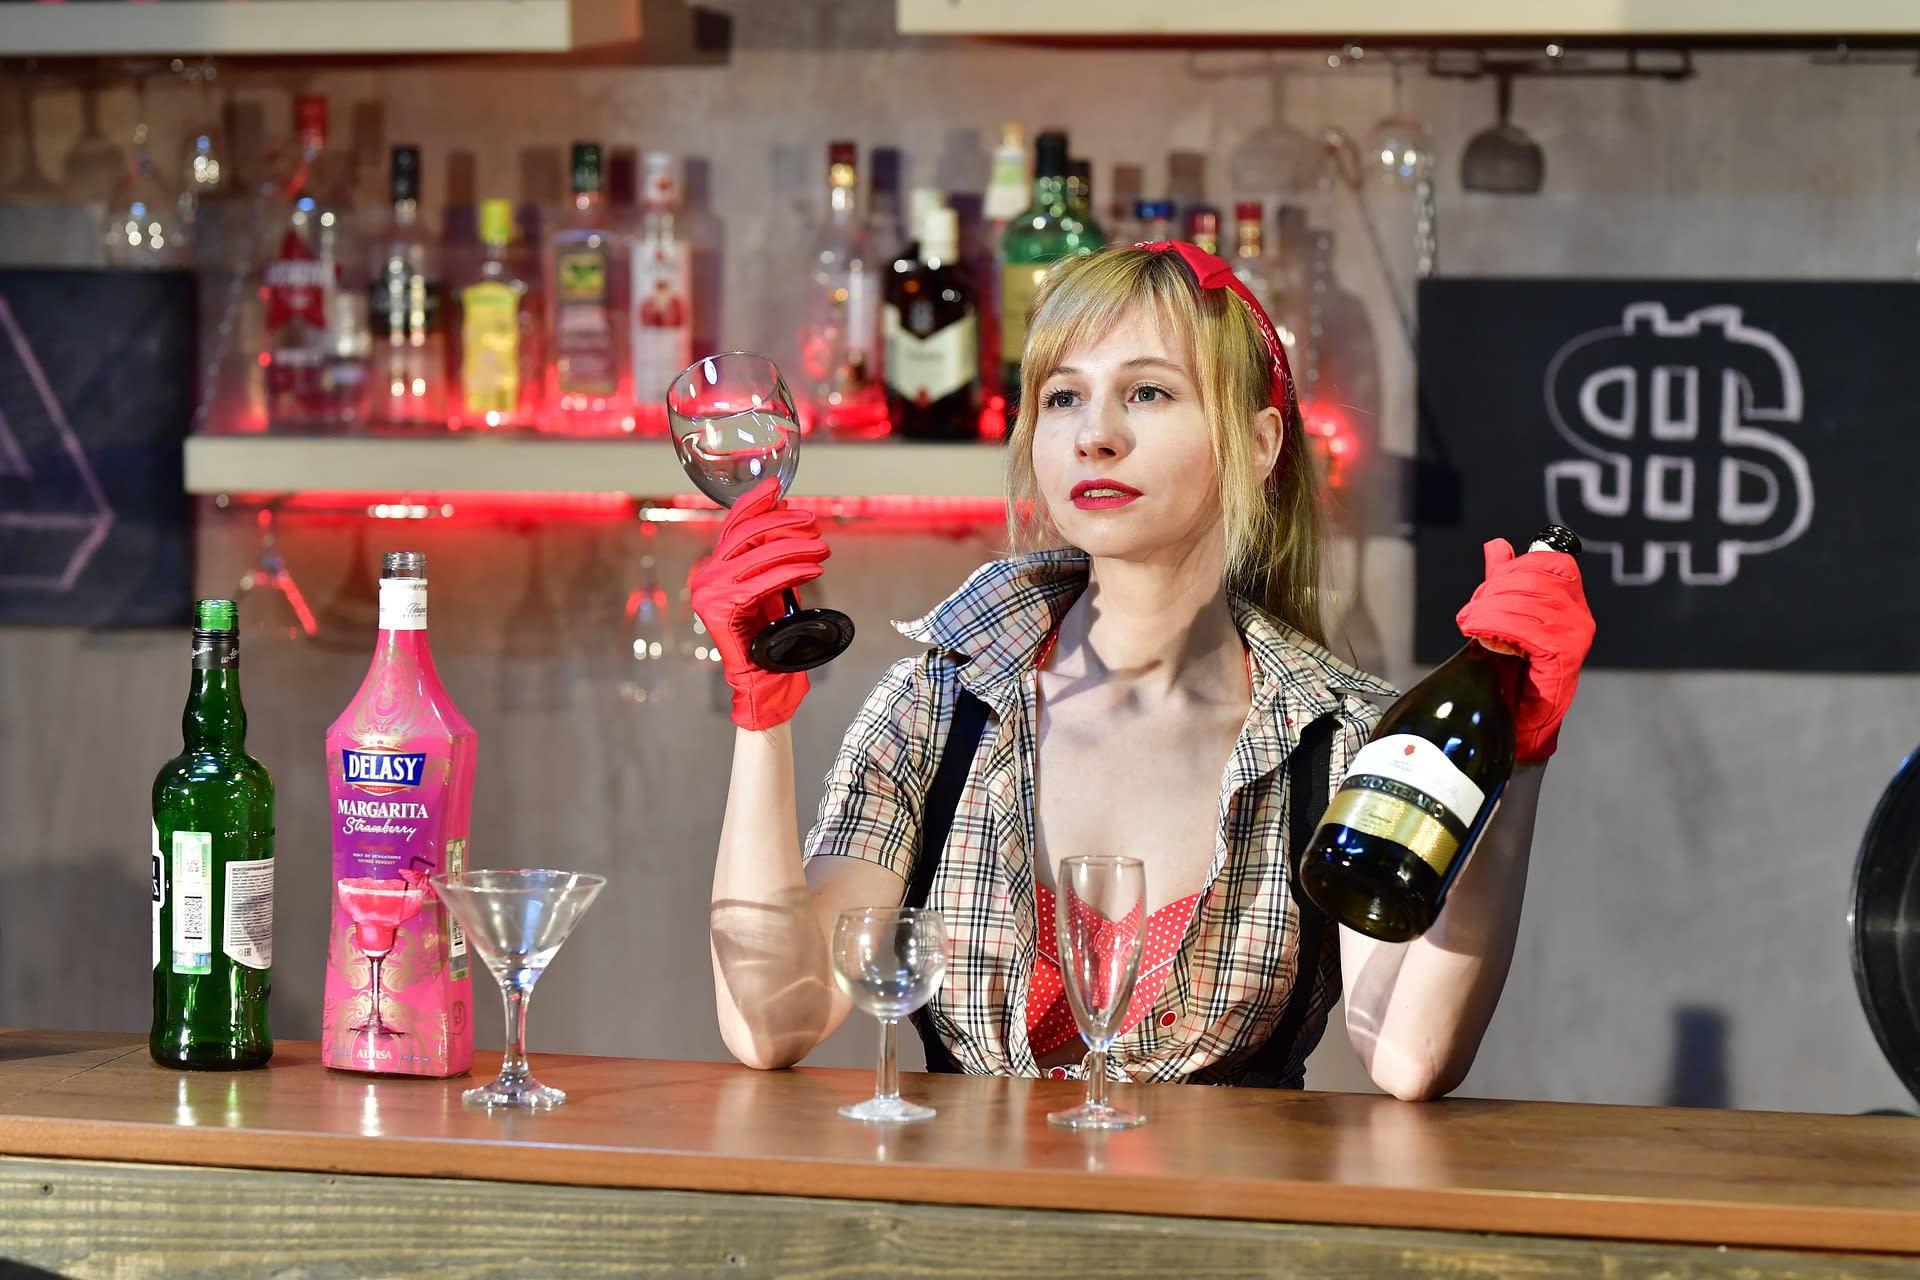 woman, bartender, liquor bottles, bar equipment, wisk